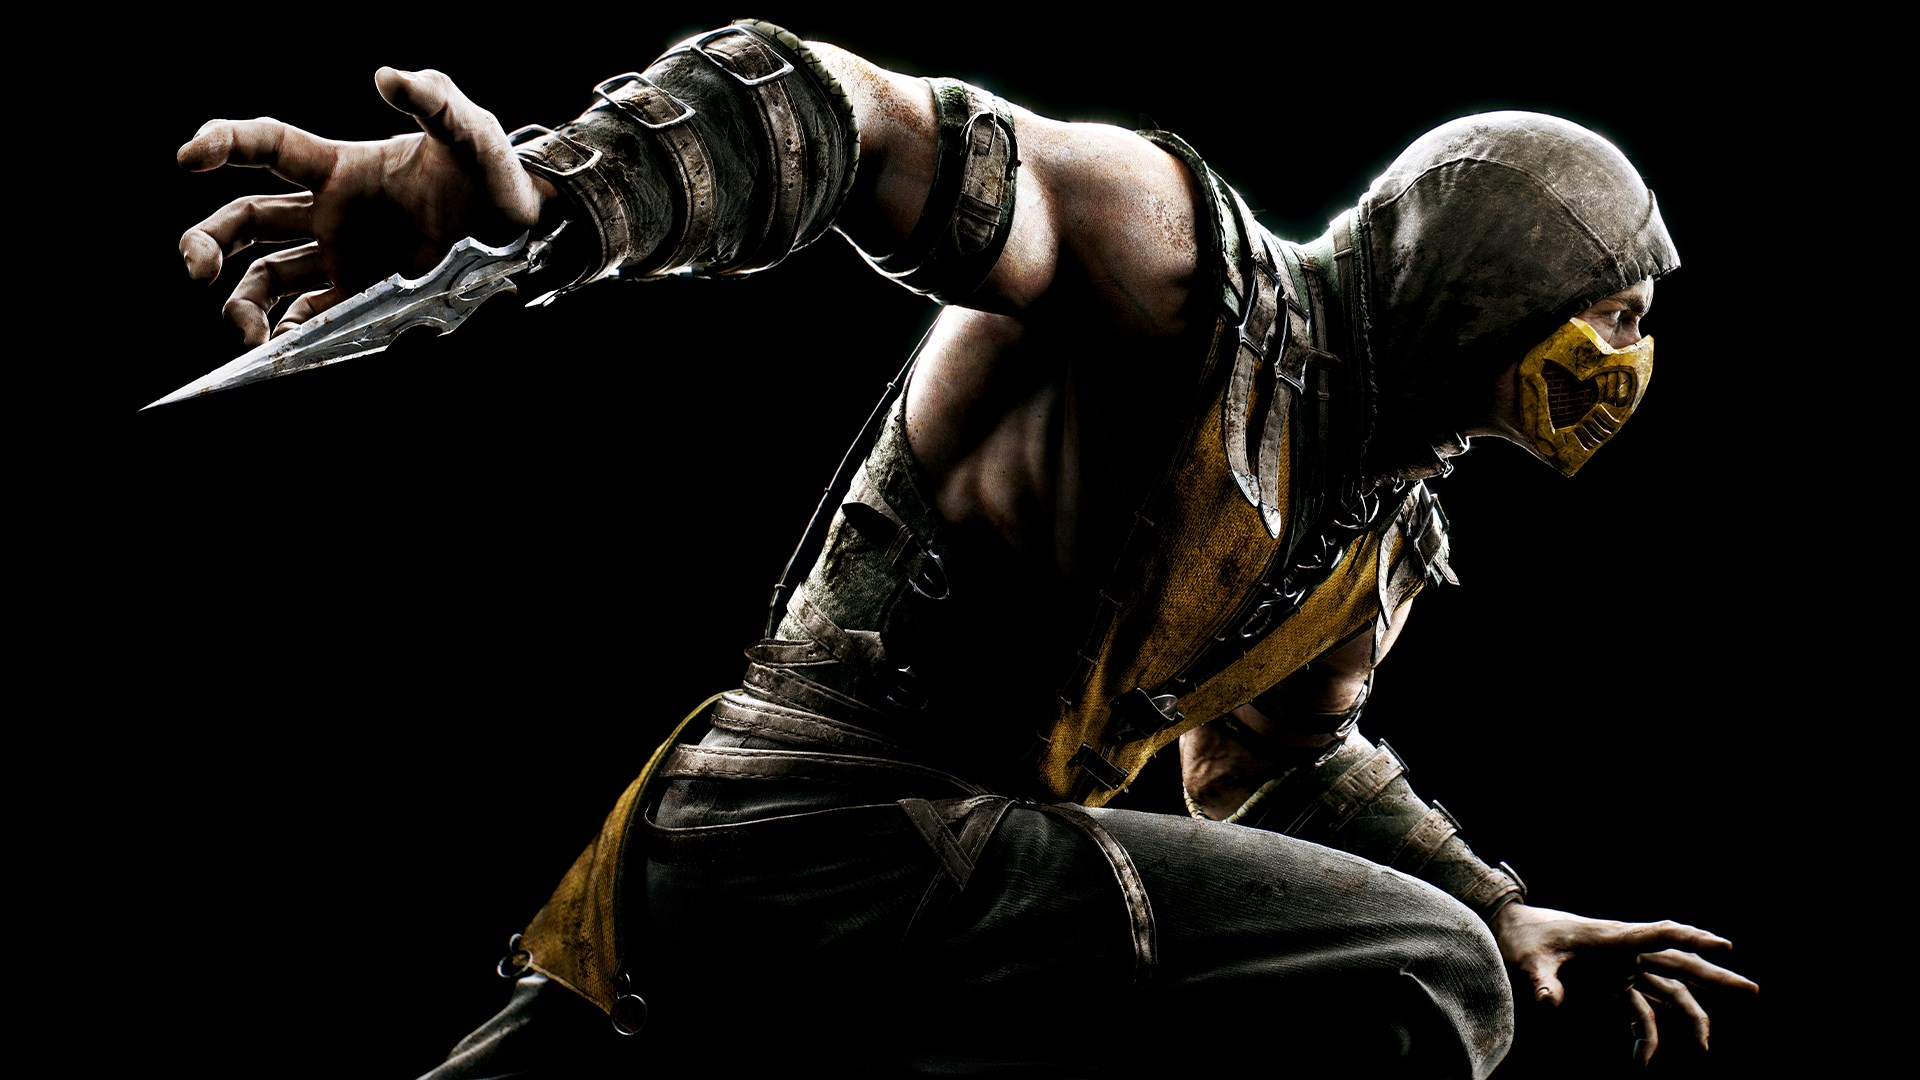 The 3 Best Mortal Kombat Games